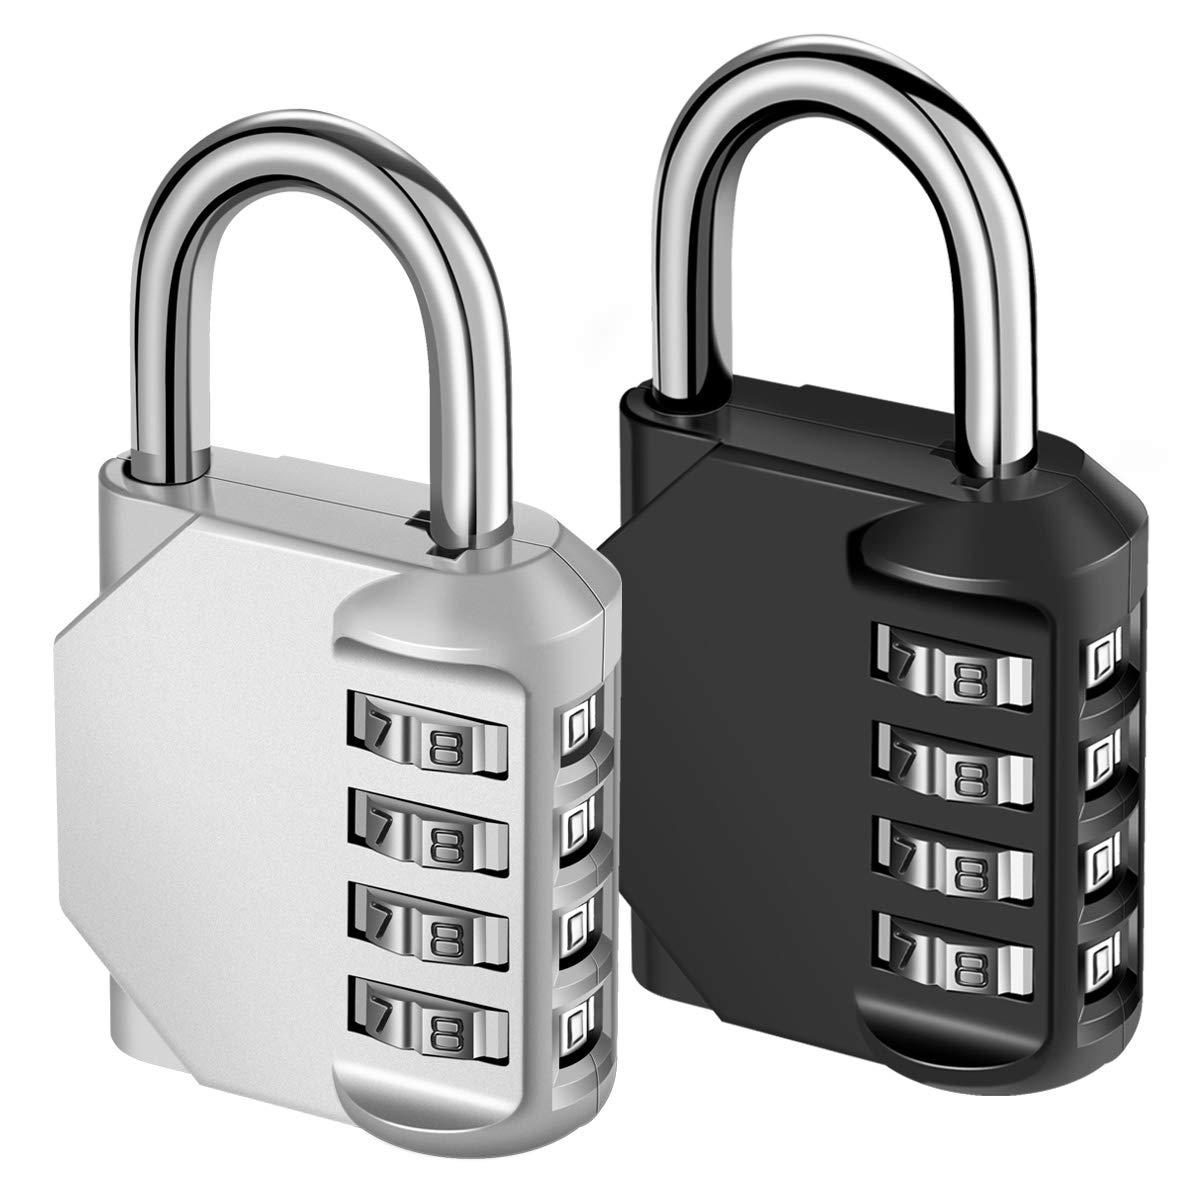 KeeKit Combination Lock, 4 Digit Combination Padlock, Waterproof ...